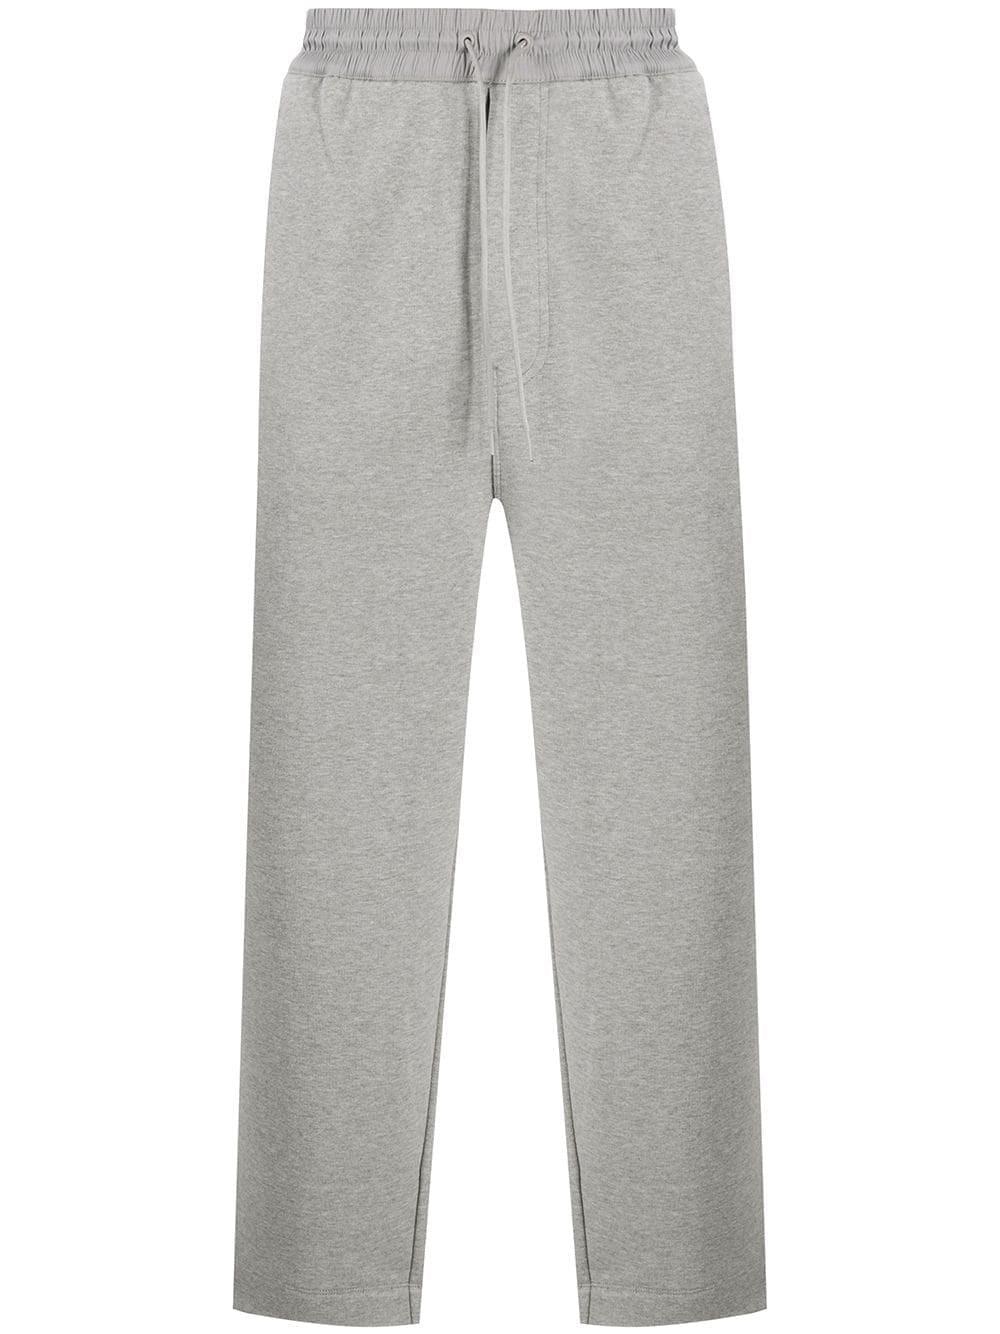 ADIDAS Y-3 Baggy Fit Sweatpants